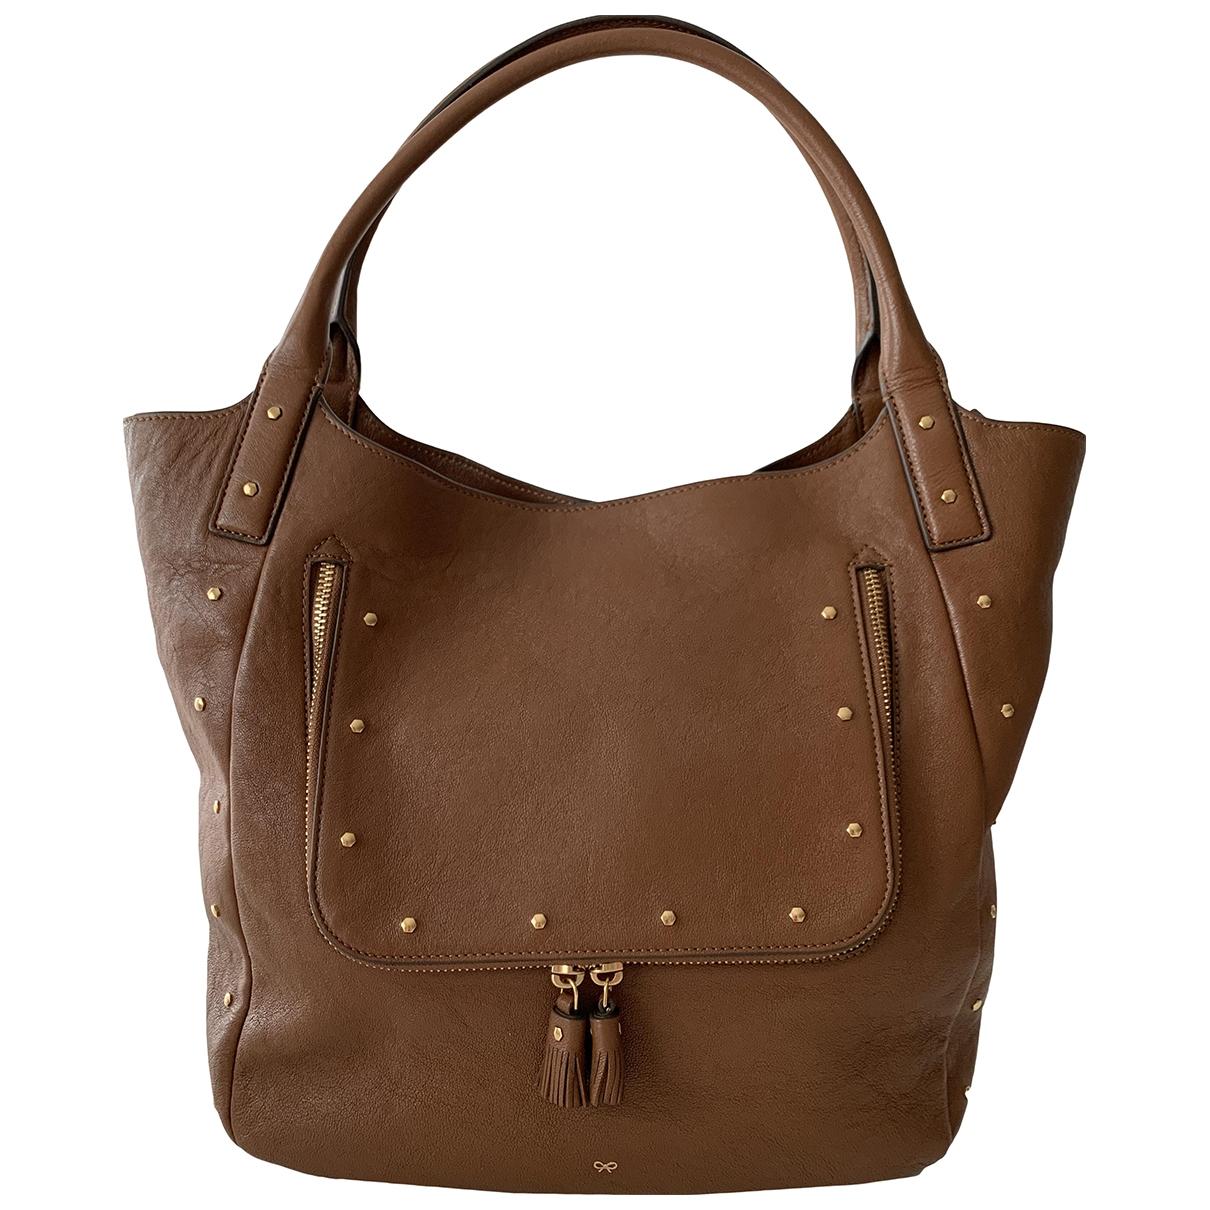 Anya Hindmarch \N Leather handbag for Women \N